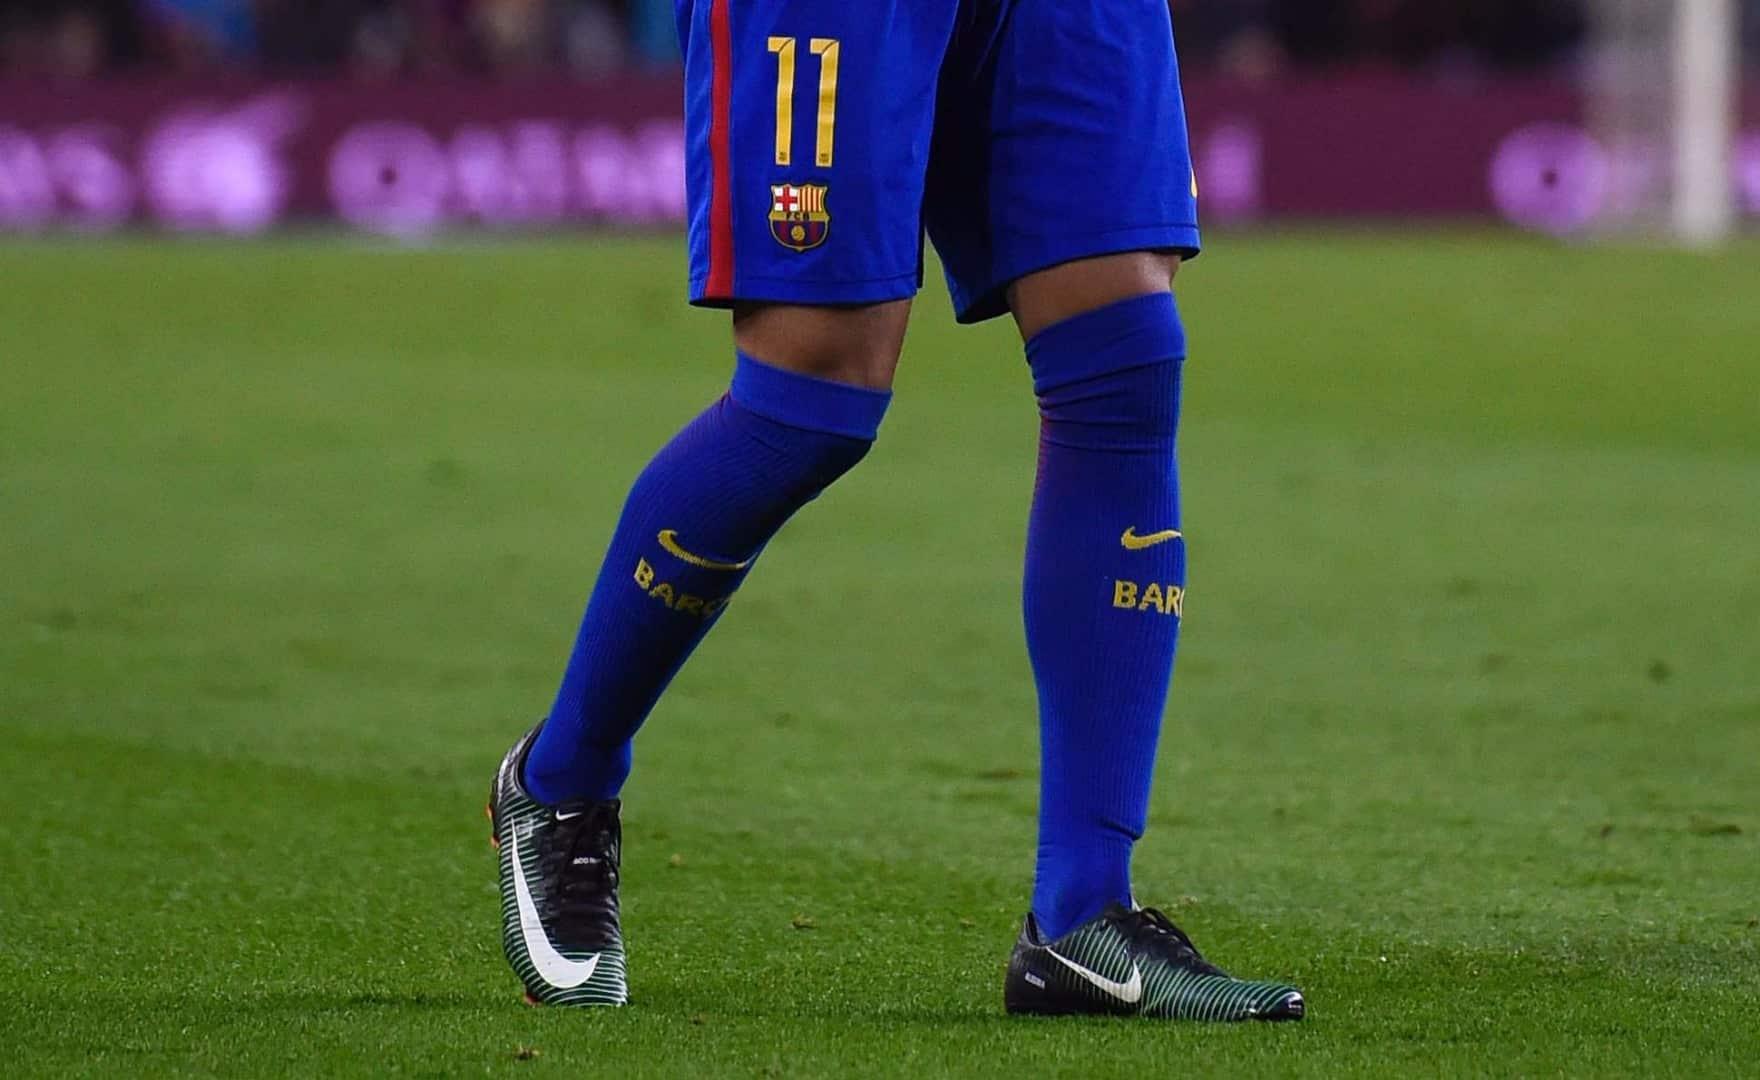 neymar-mercurial-vapor-x-dark-lightning-img1